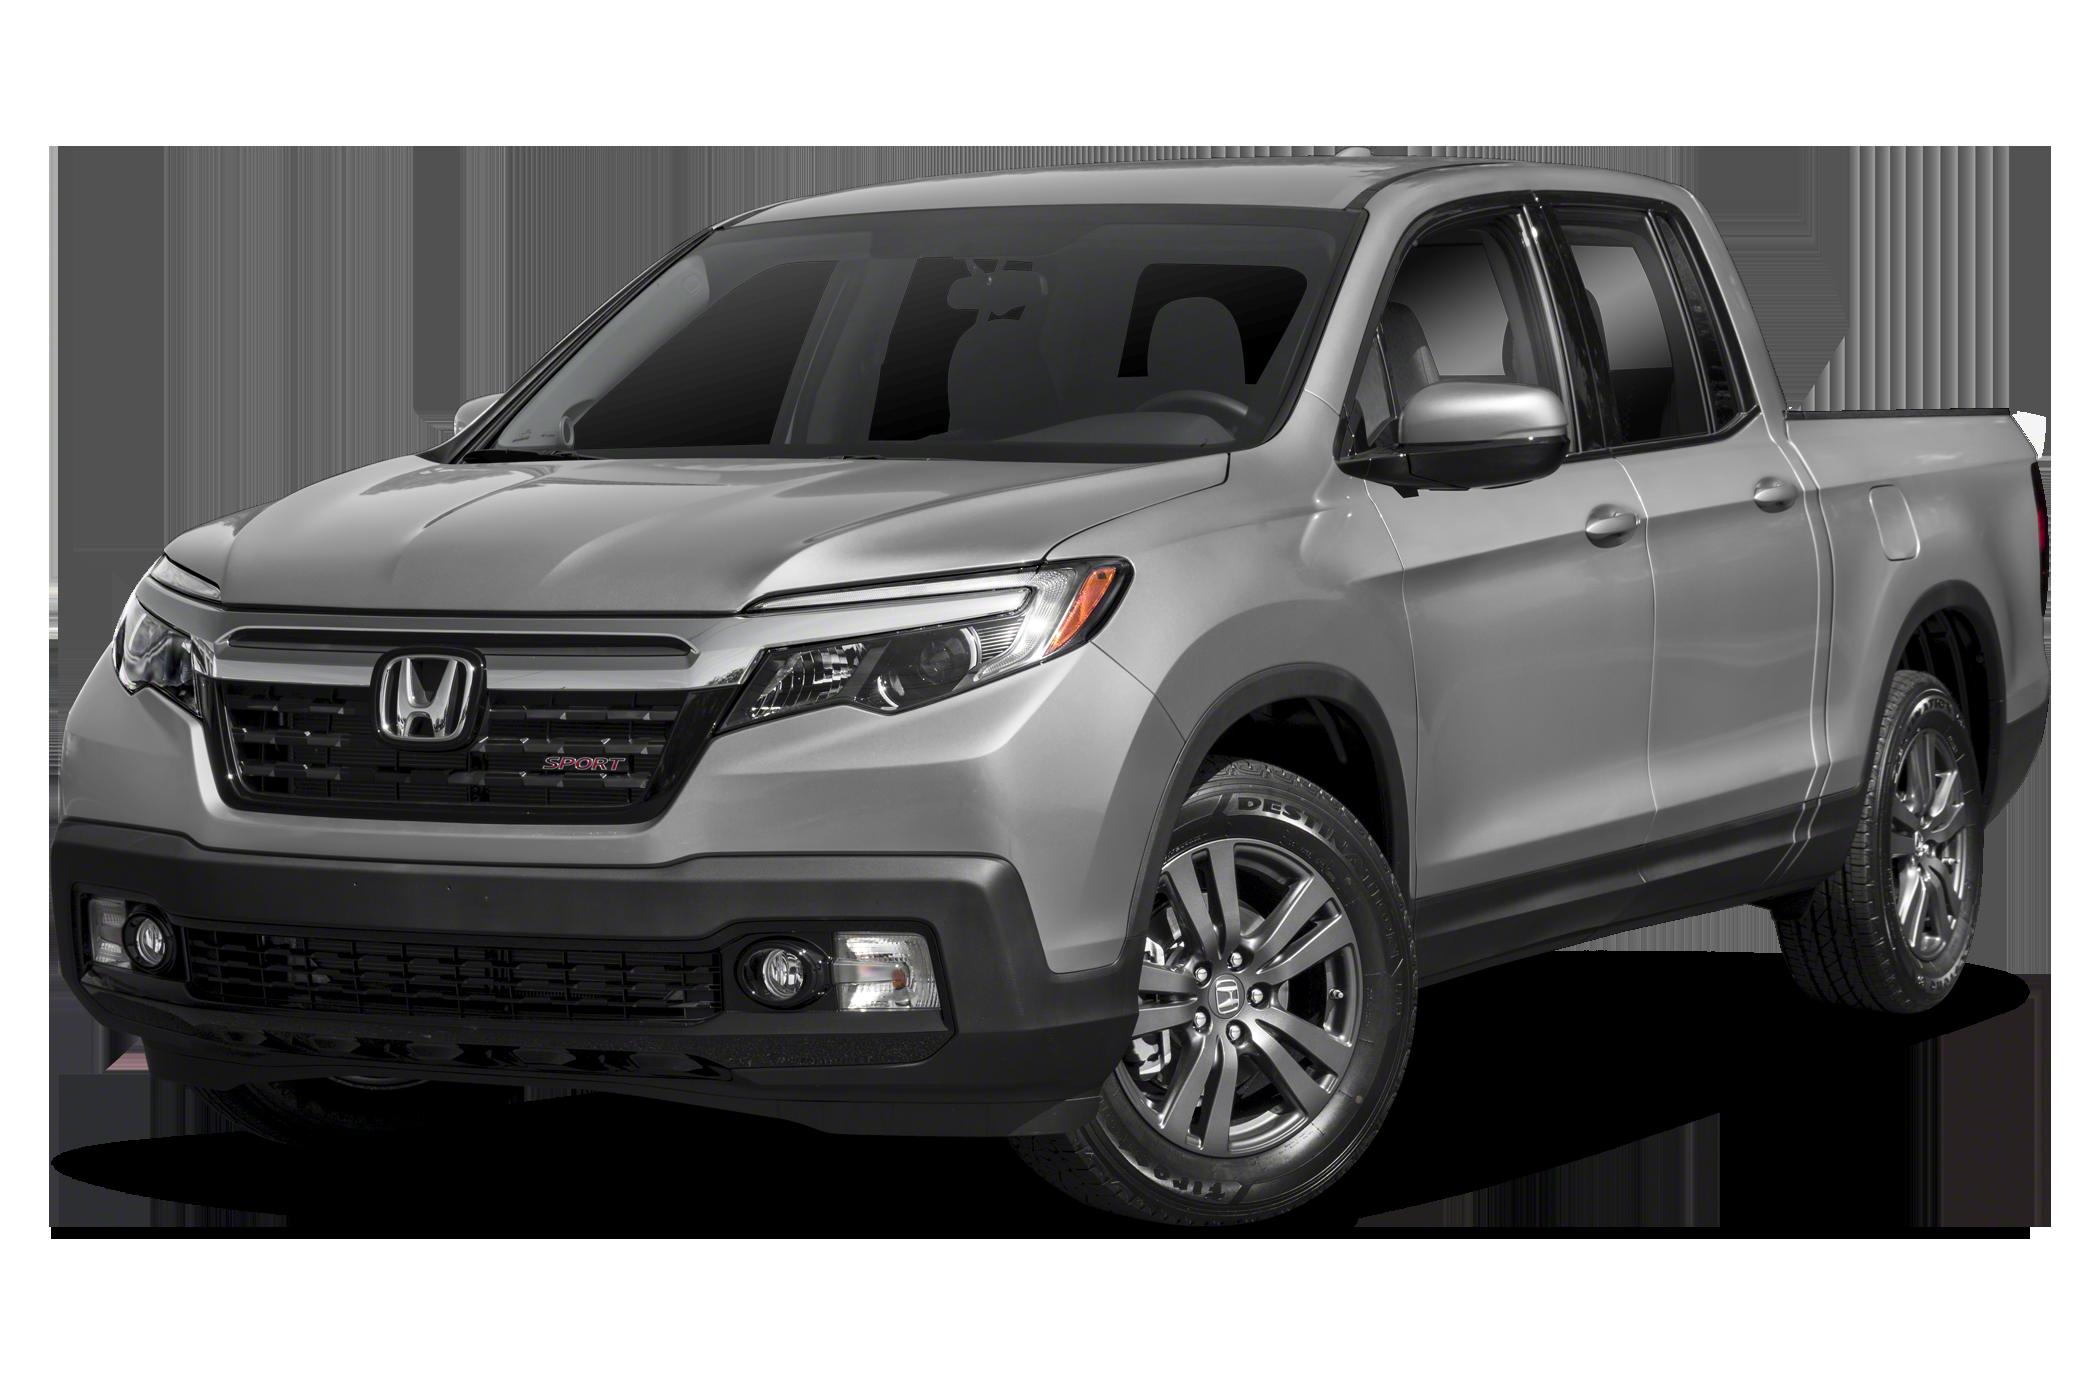 Compare Honda/Ridgeline to Nissan/Frontier